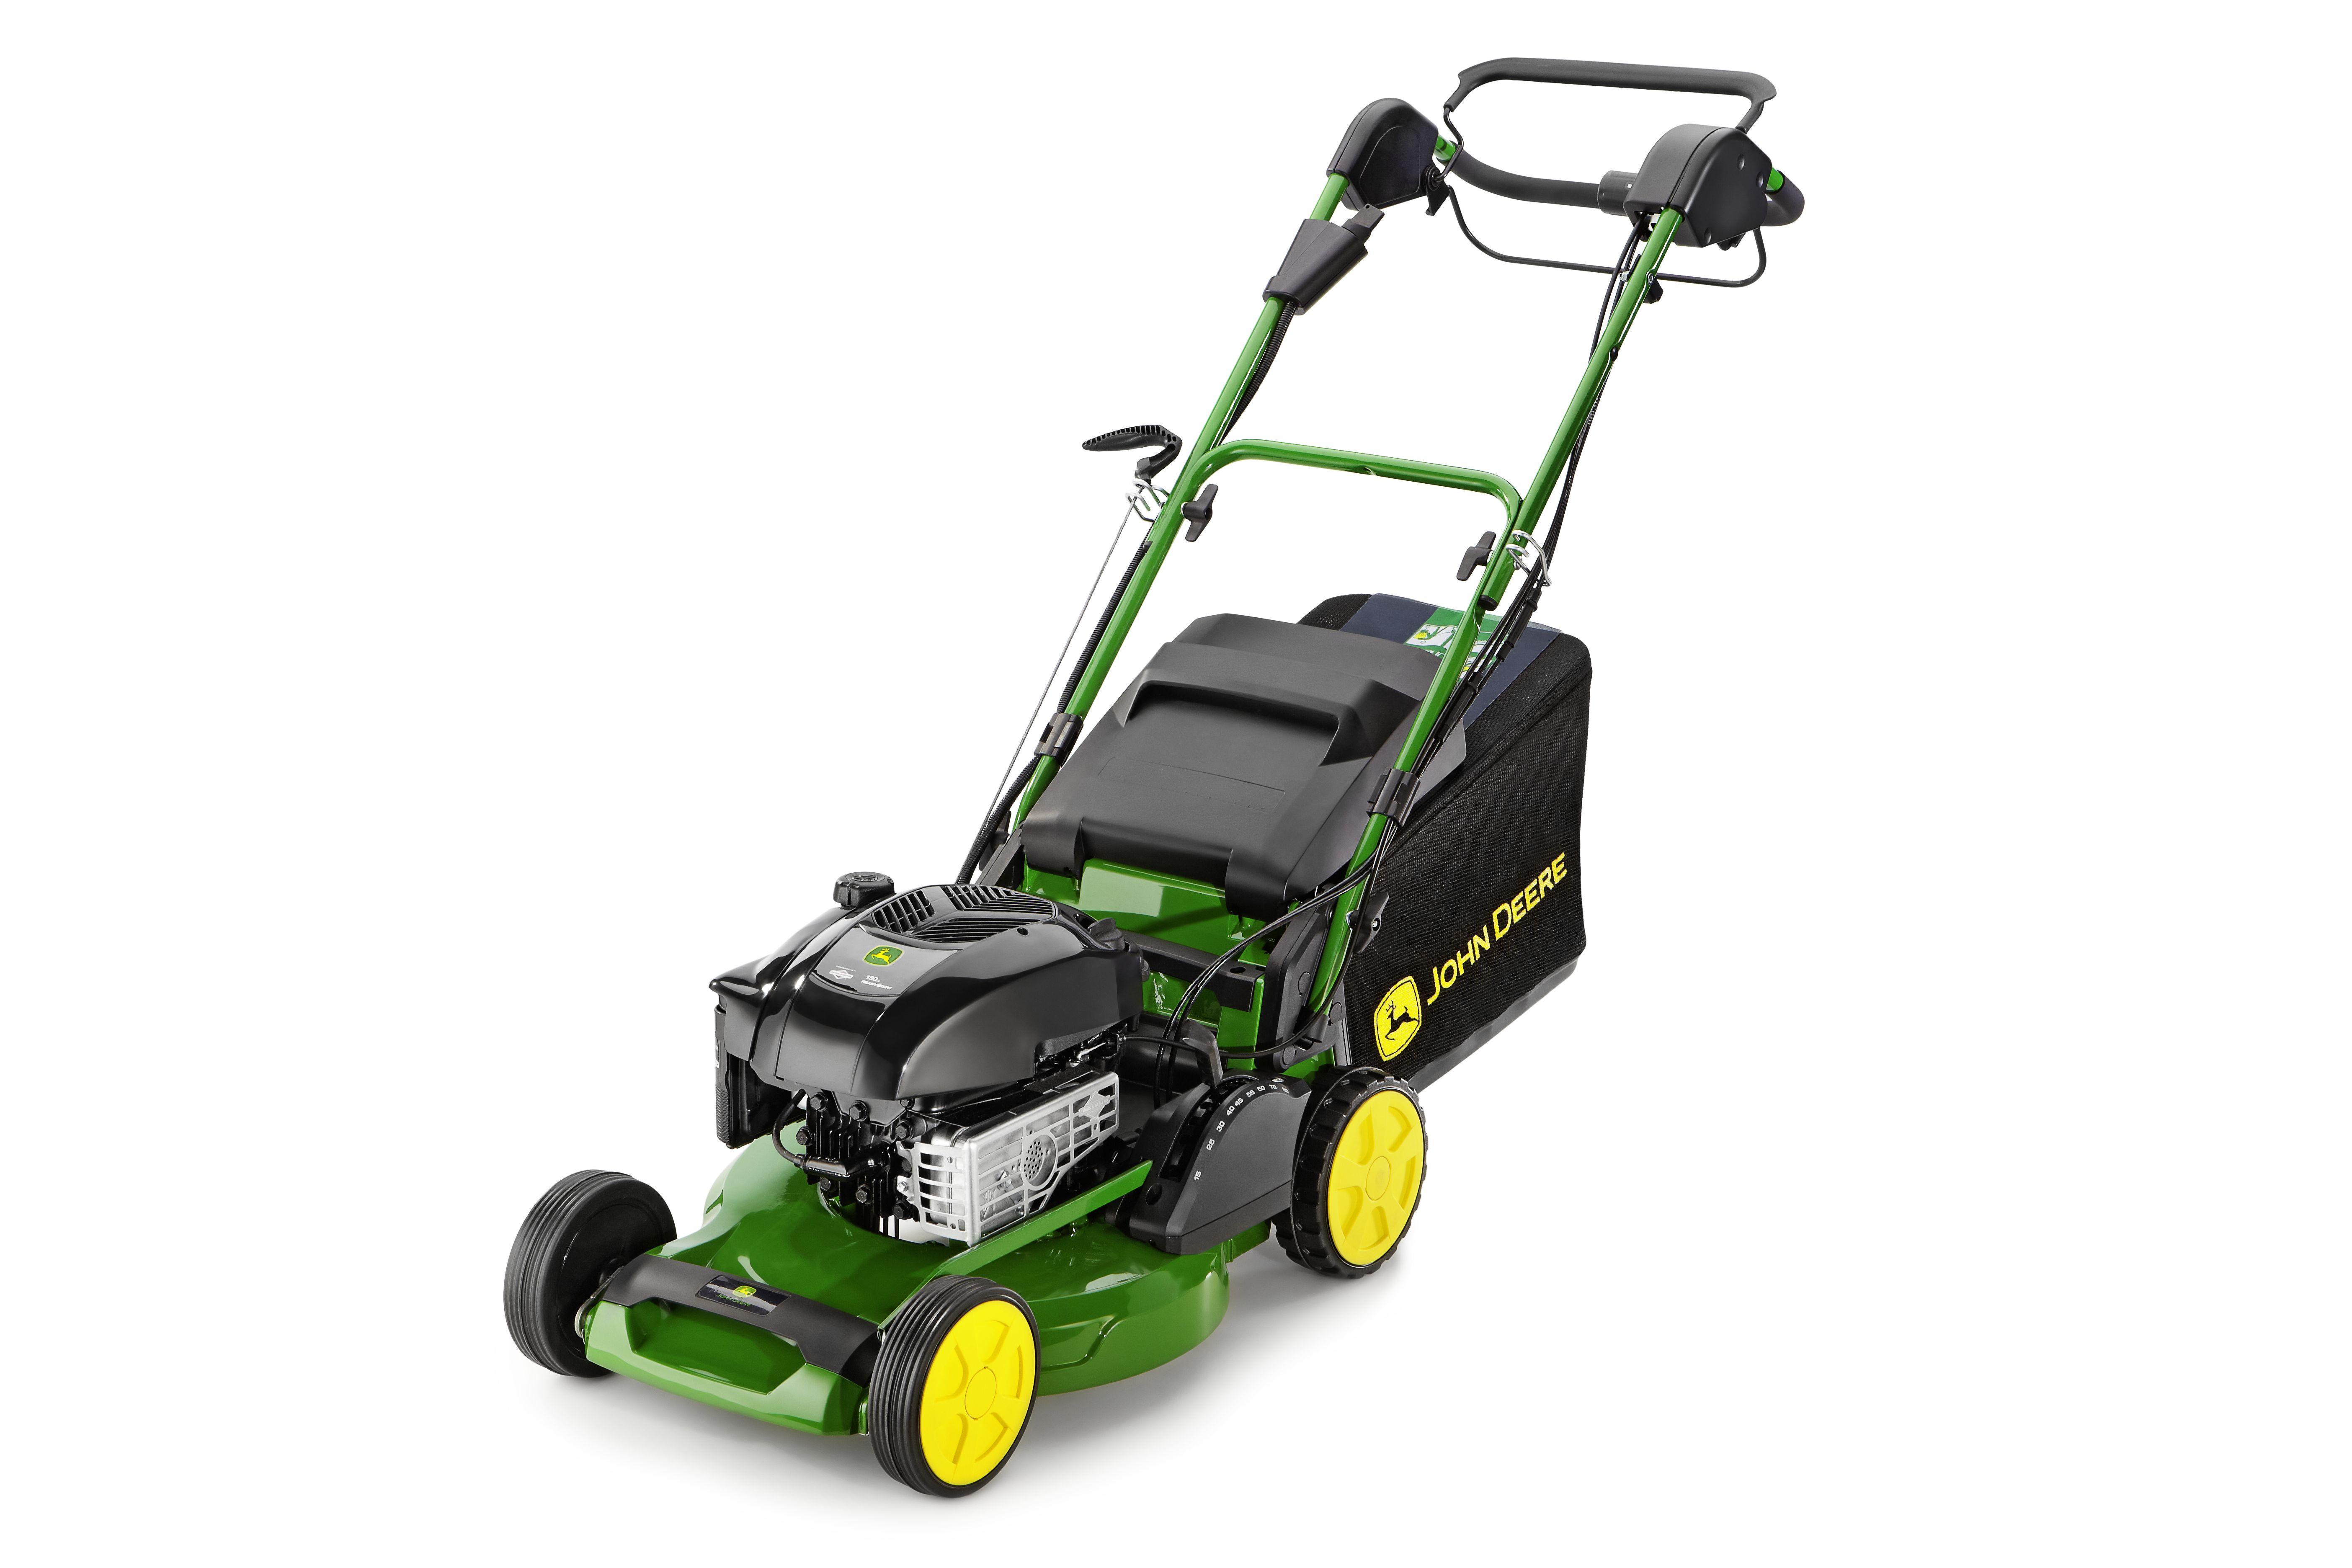 Lawn Mower Overhaul : Benefits of mobile lawn mower repair greg s small engine